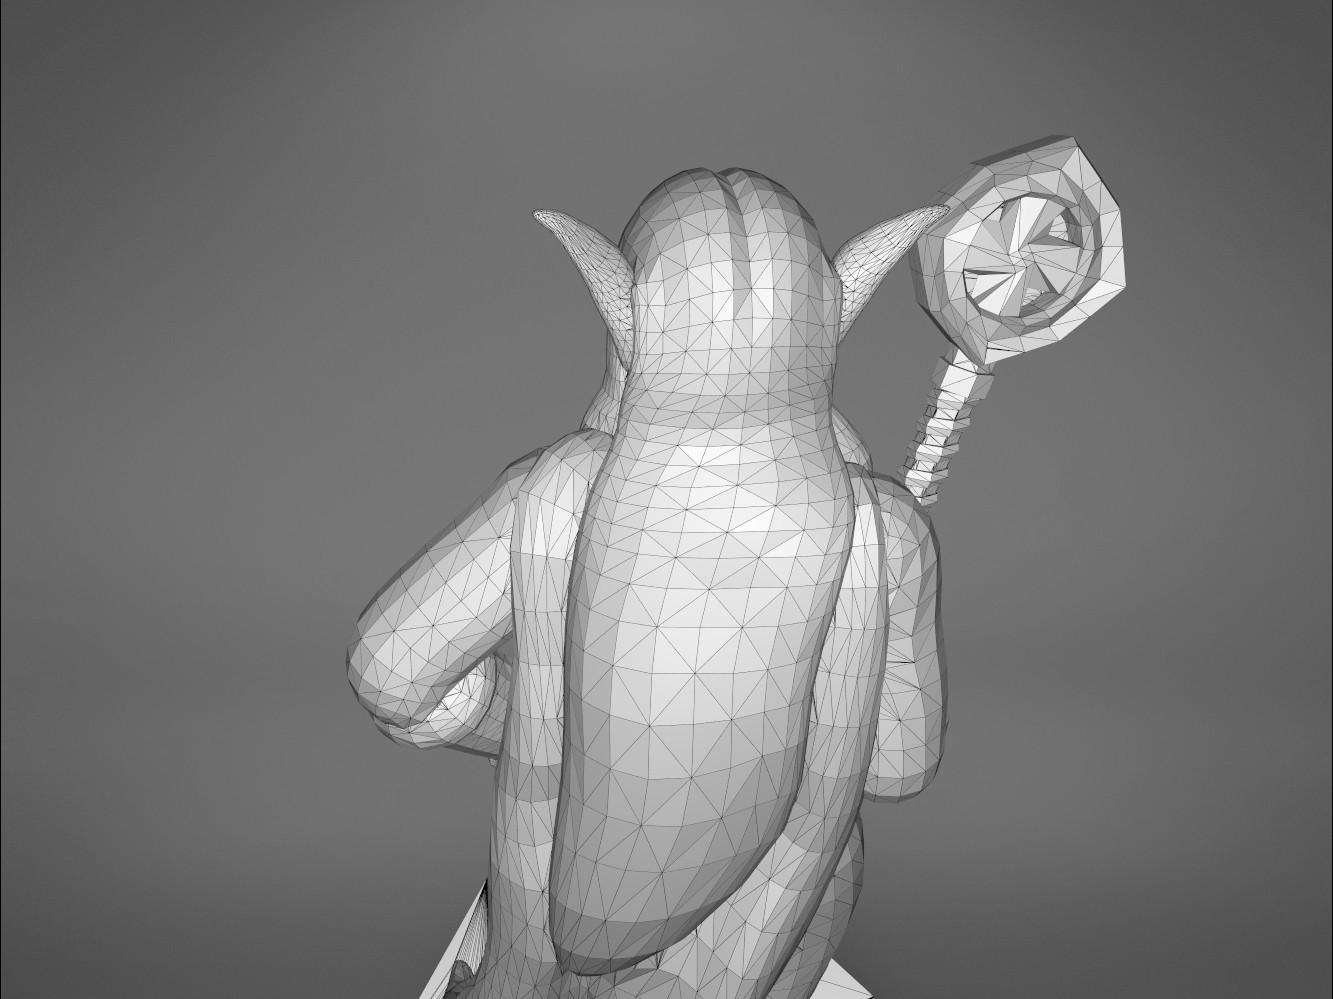 Mage_2_-detail_5.191.jpg Download STL file ELF MAGE FEMALE CHARACTER GAME FIGURES 3D print model • 3D printing template, 3D-mon